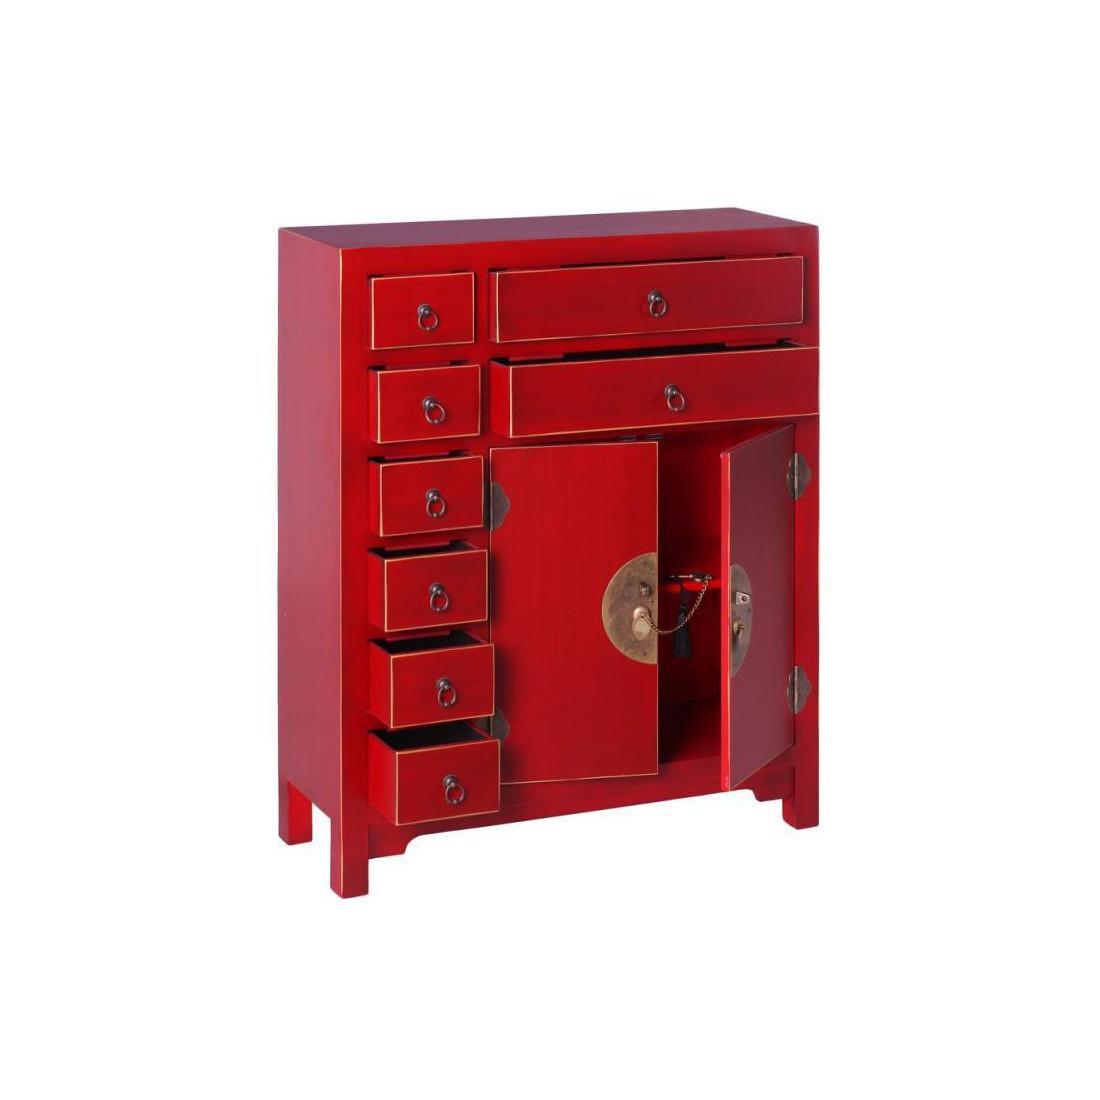 portes tiroirs meuble d entree wPTlOXuZik